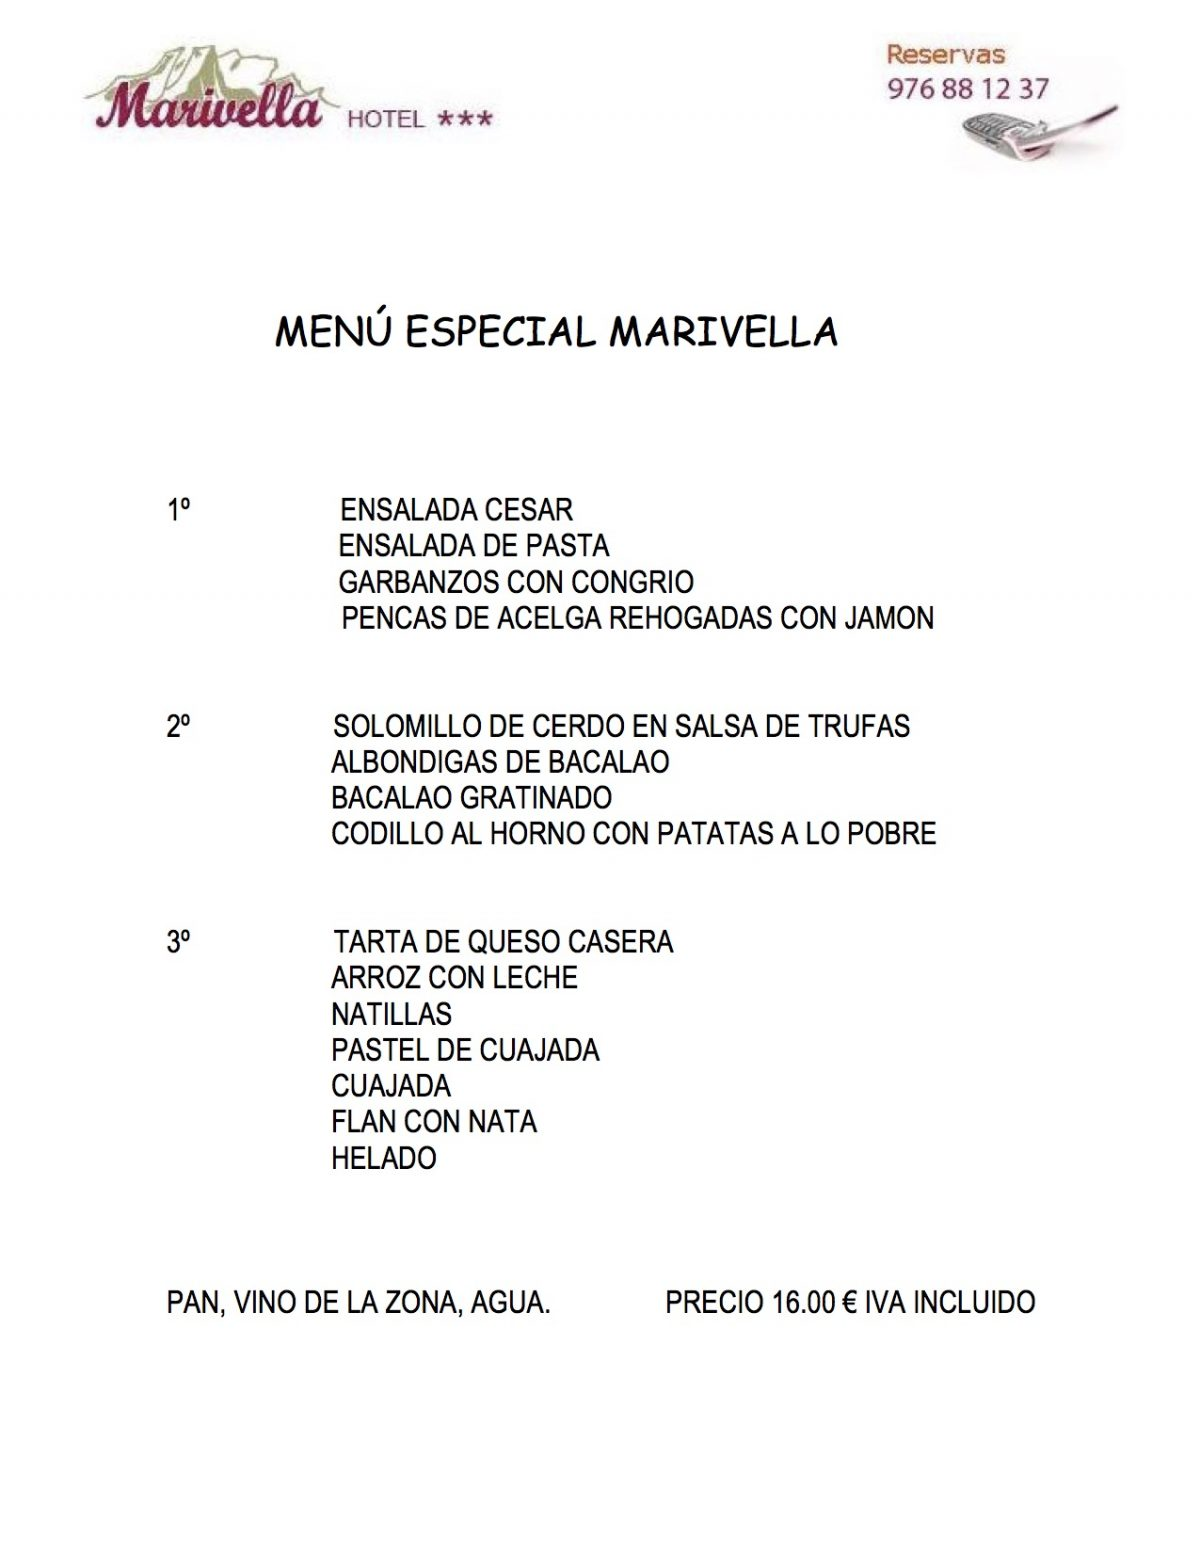 MENU-ESPECIAL-MARIVELLA-ENSALADA-PASTA-SEMANA-SANTA-2017-1200x1553.jpg